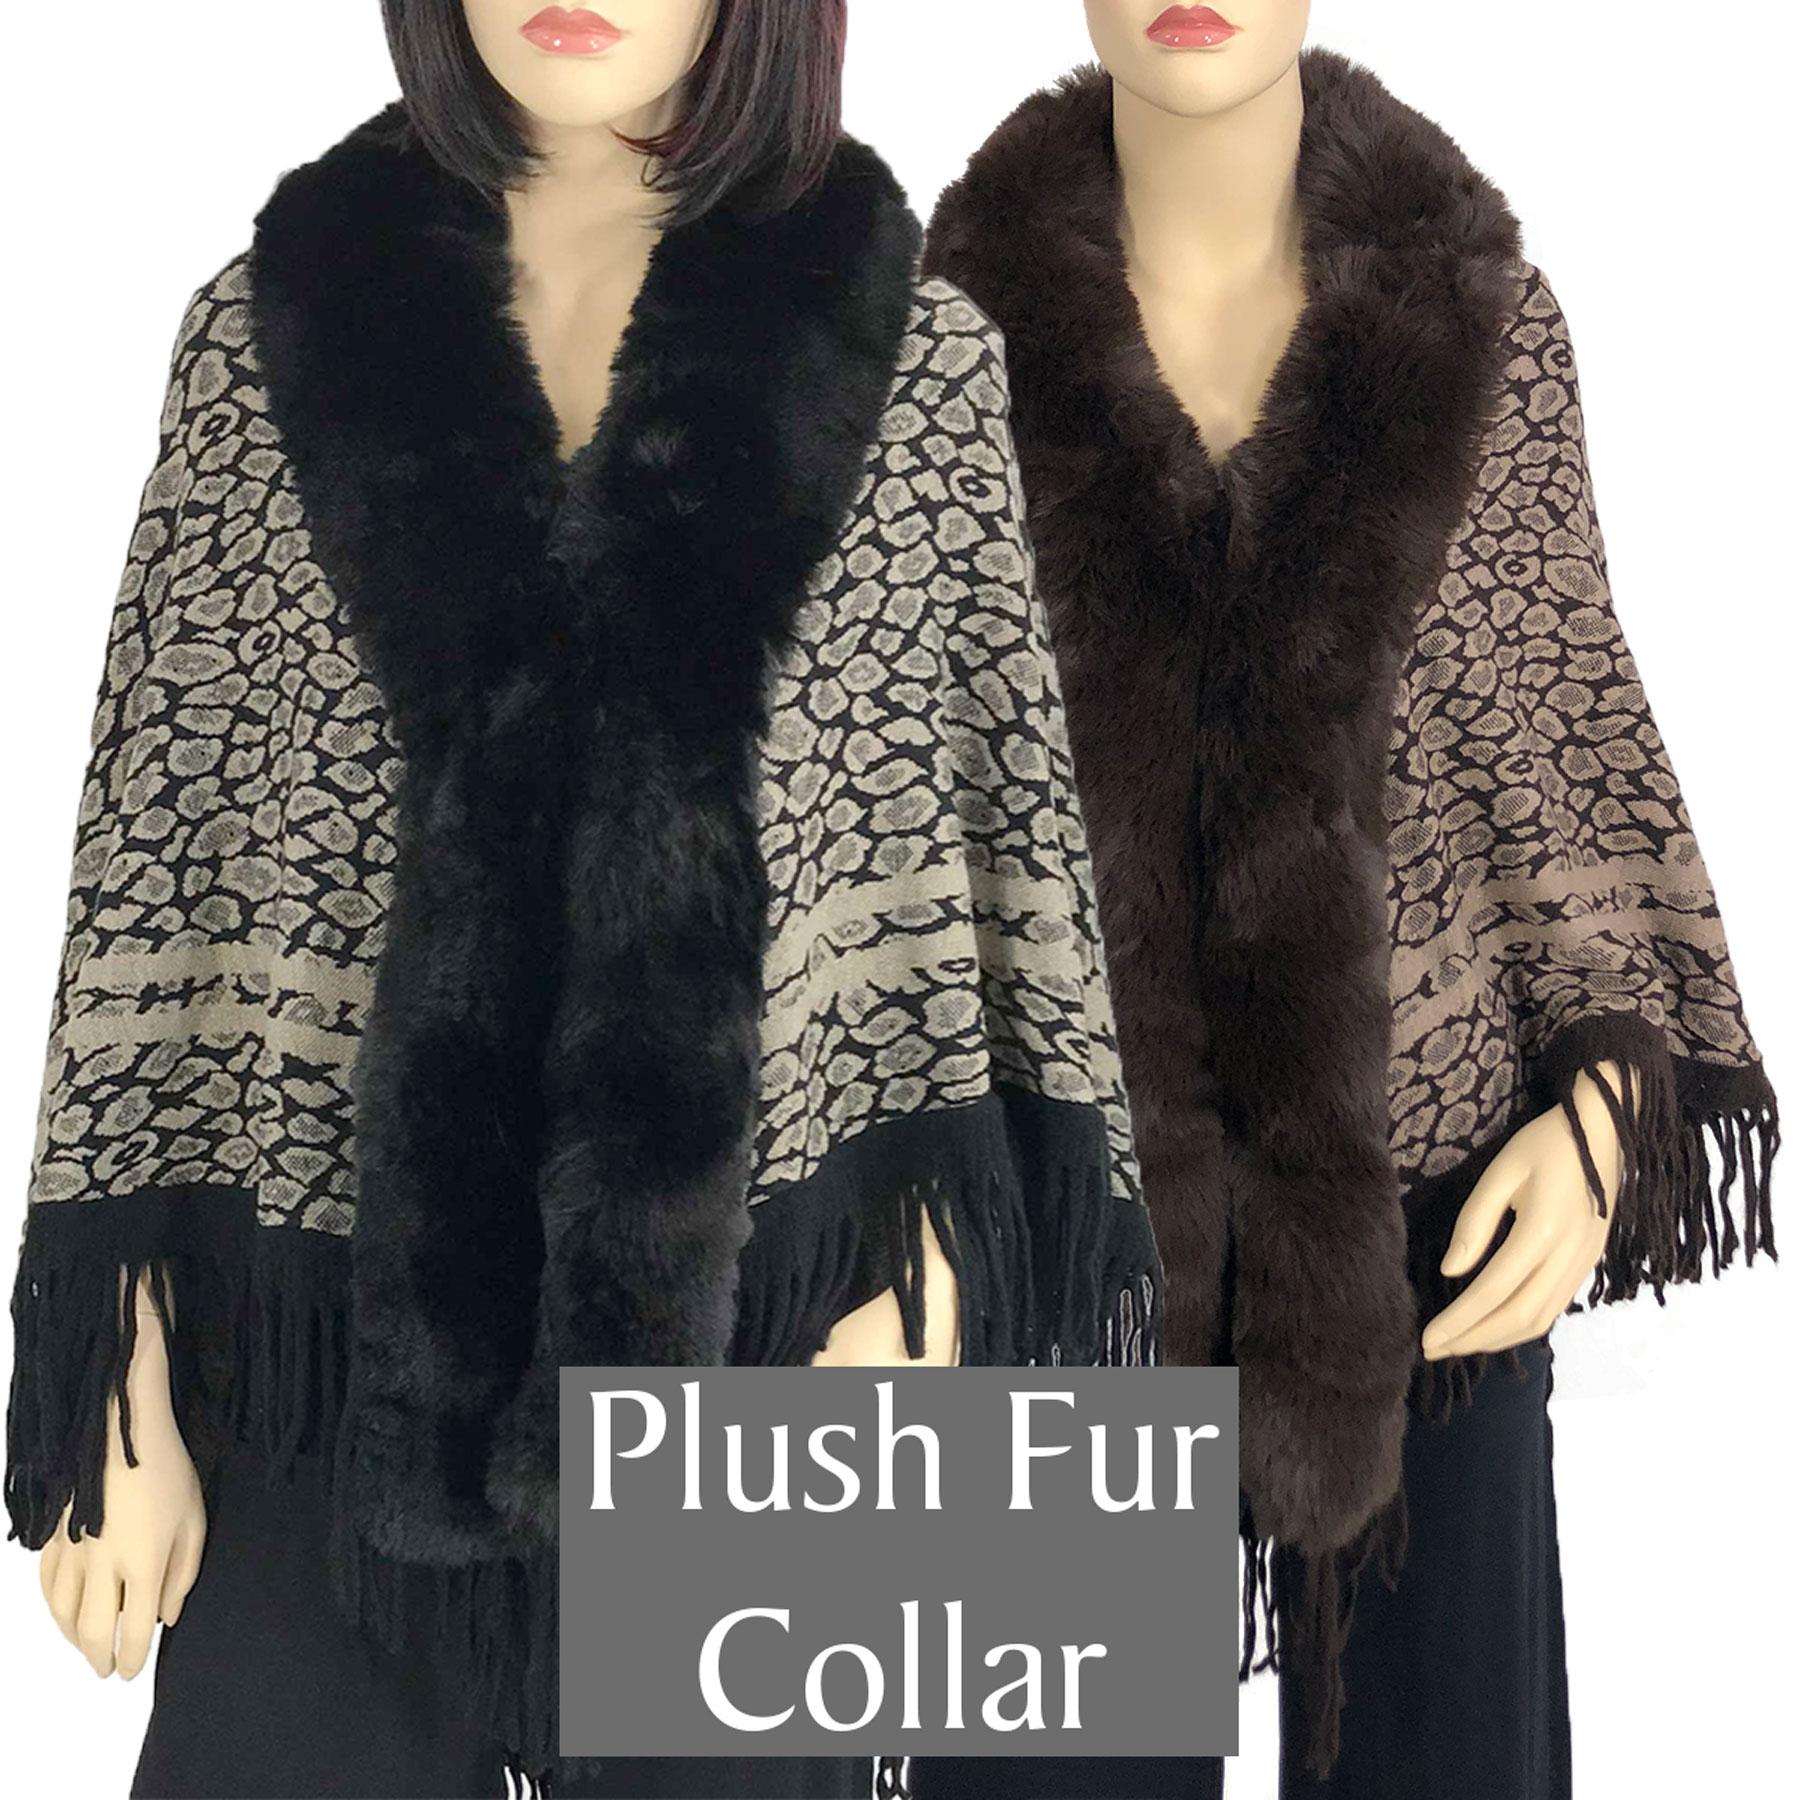 Capes - Leopard w/ Faux Rabbit Fur 98B7